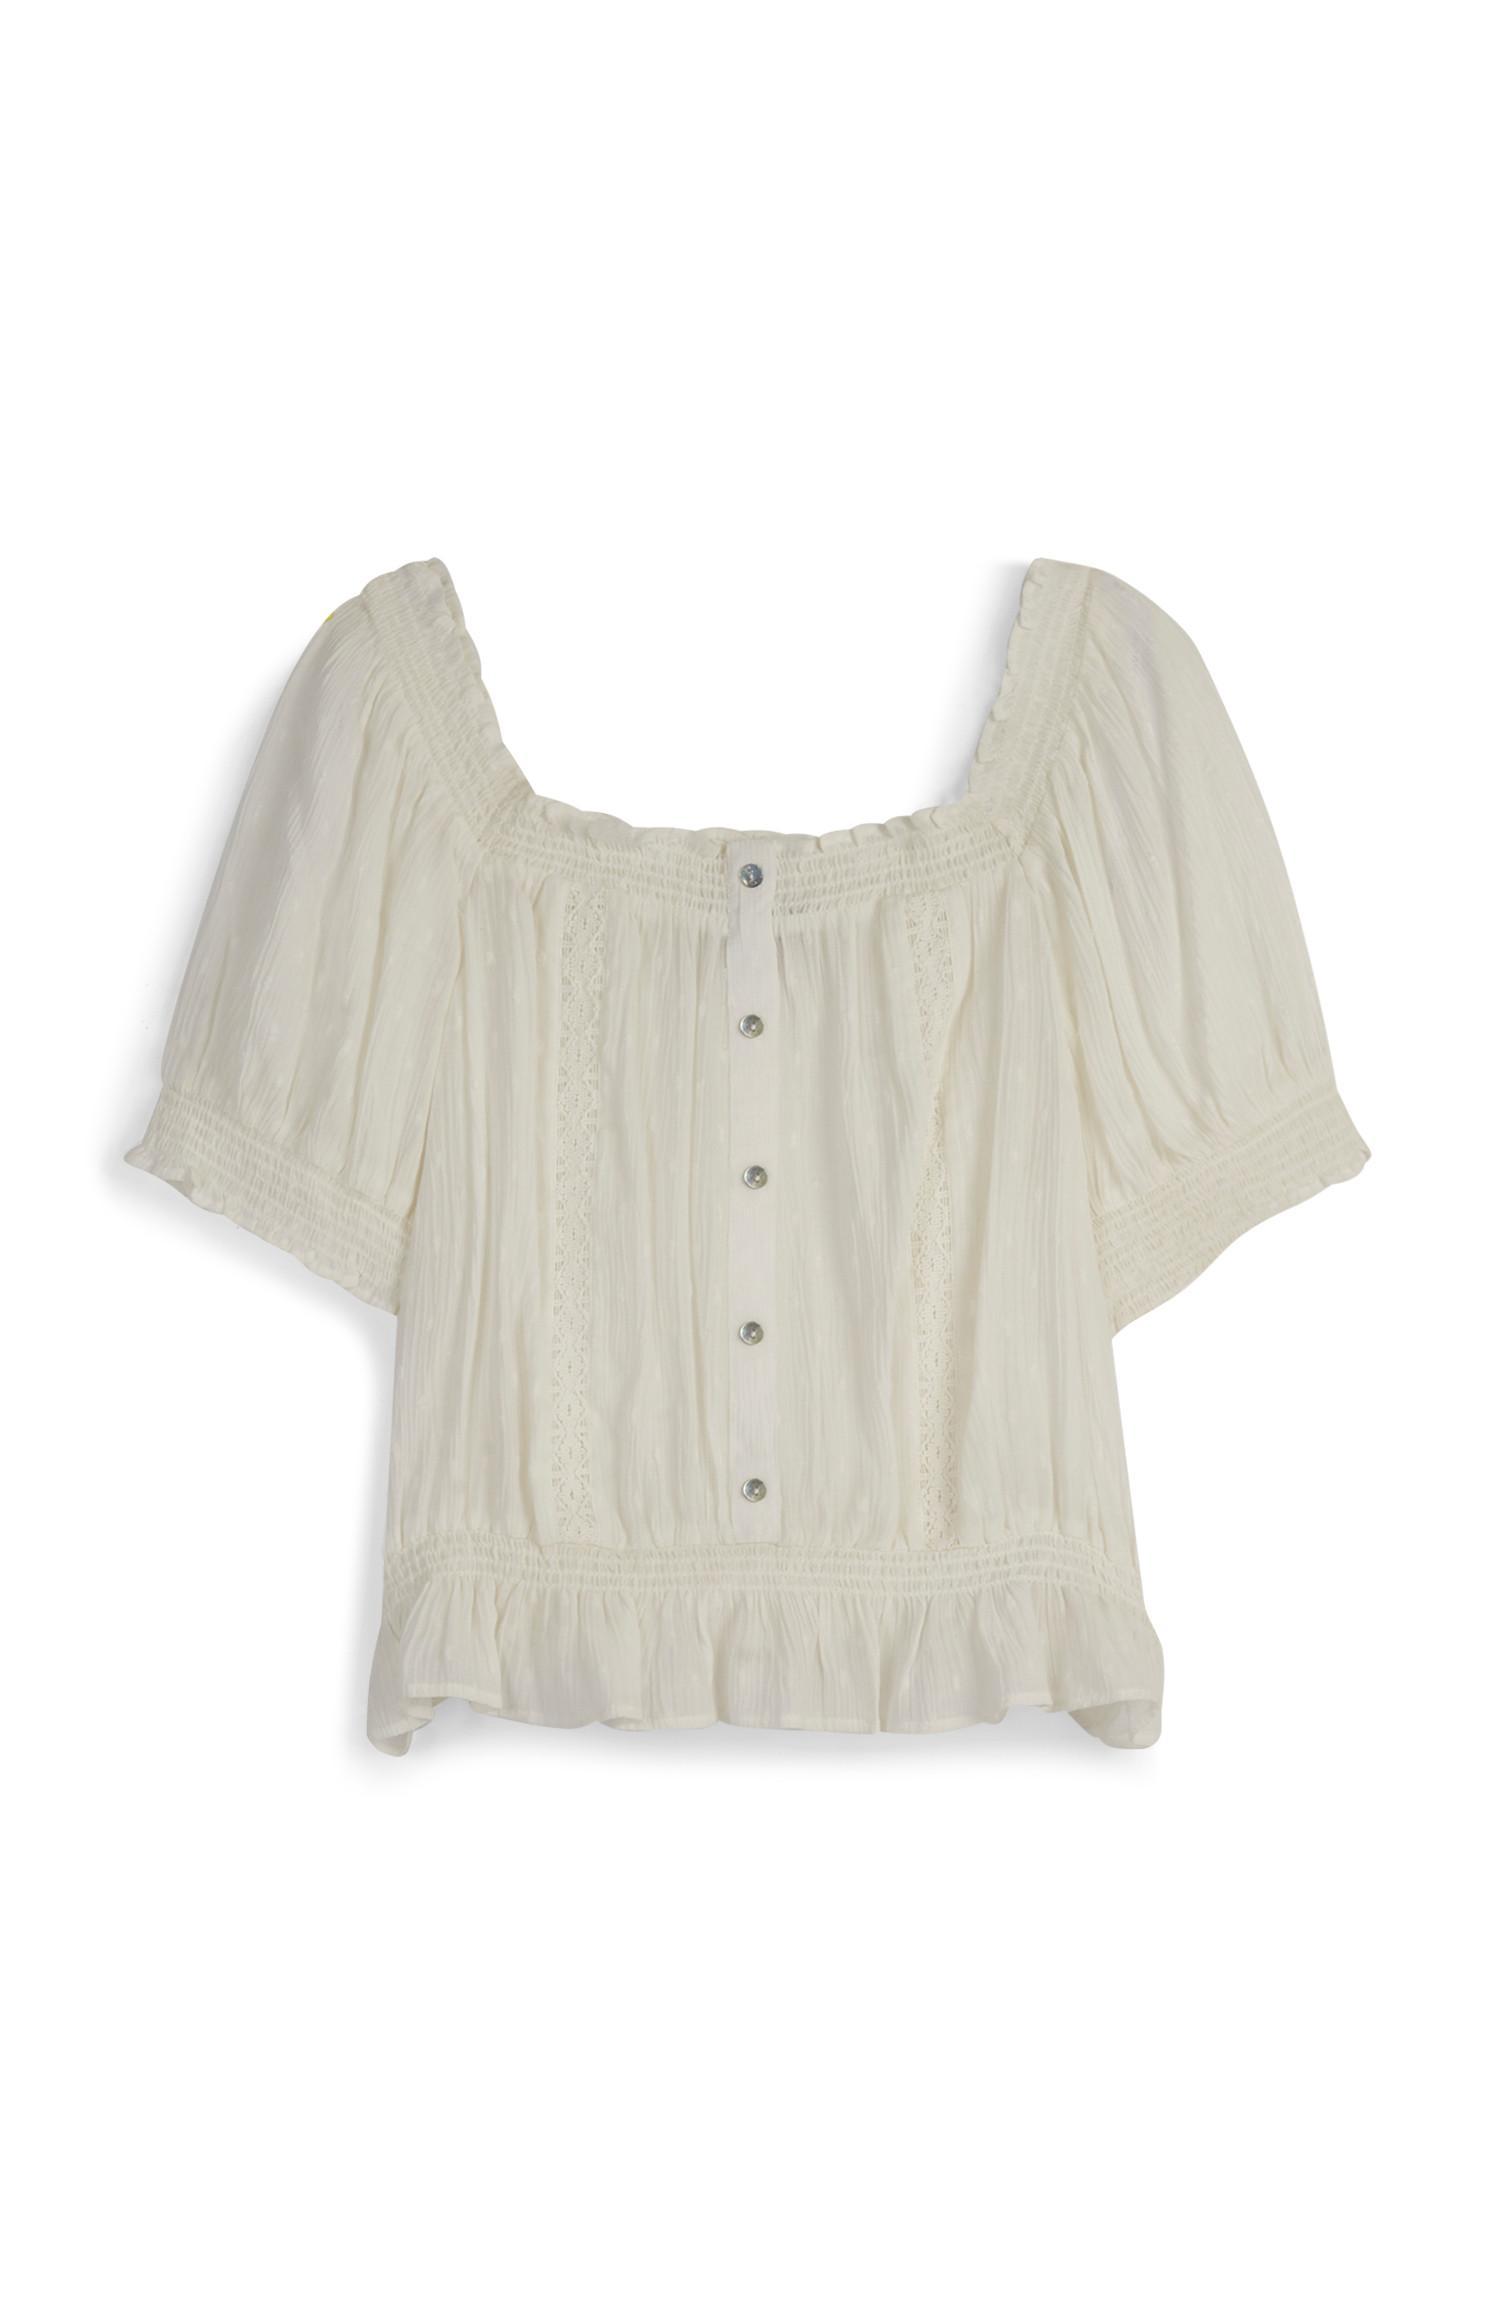 Ivoorwitte blouse met kanten details